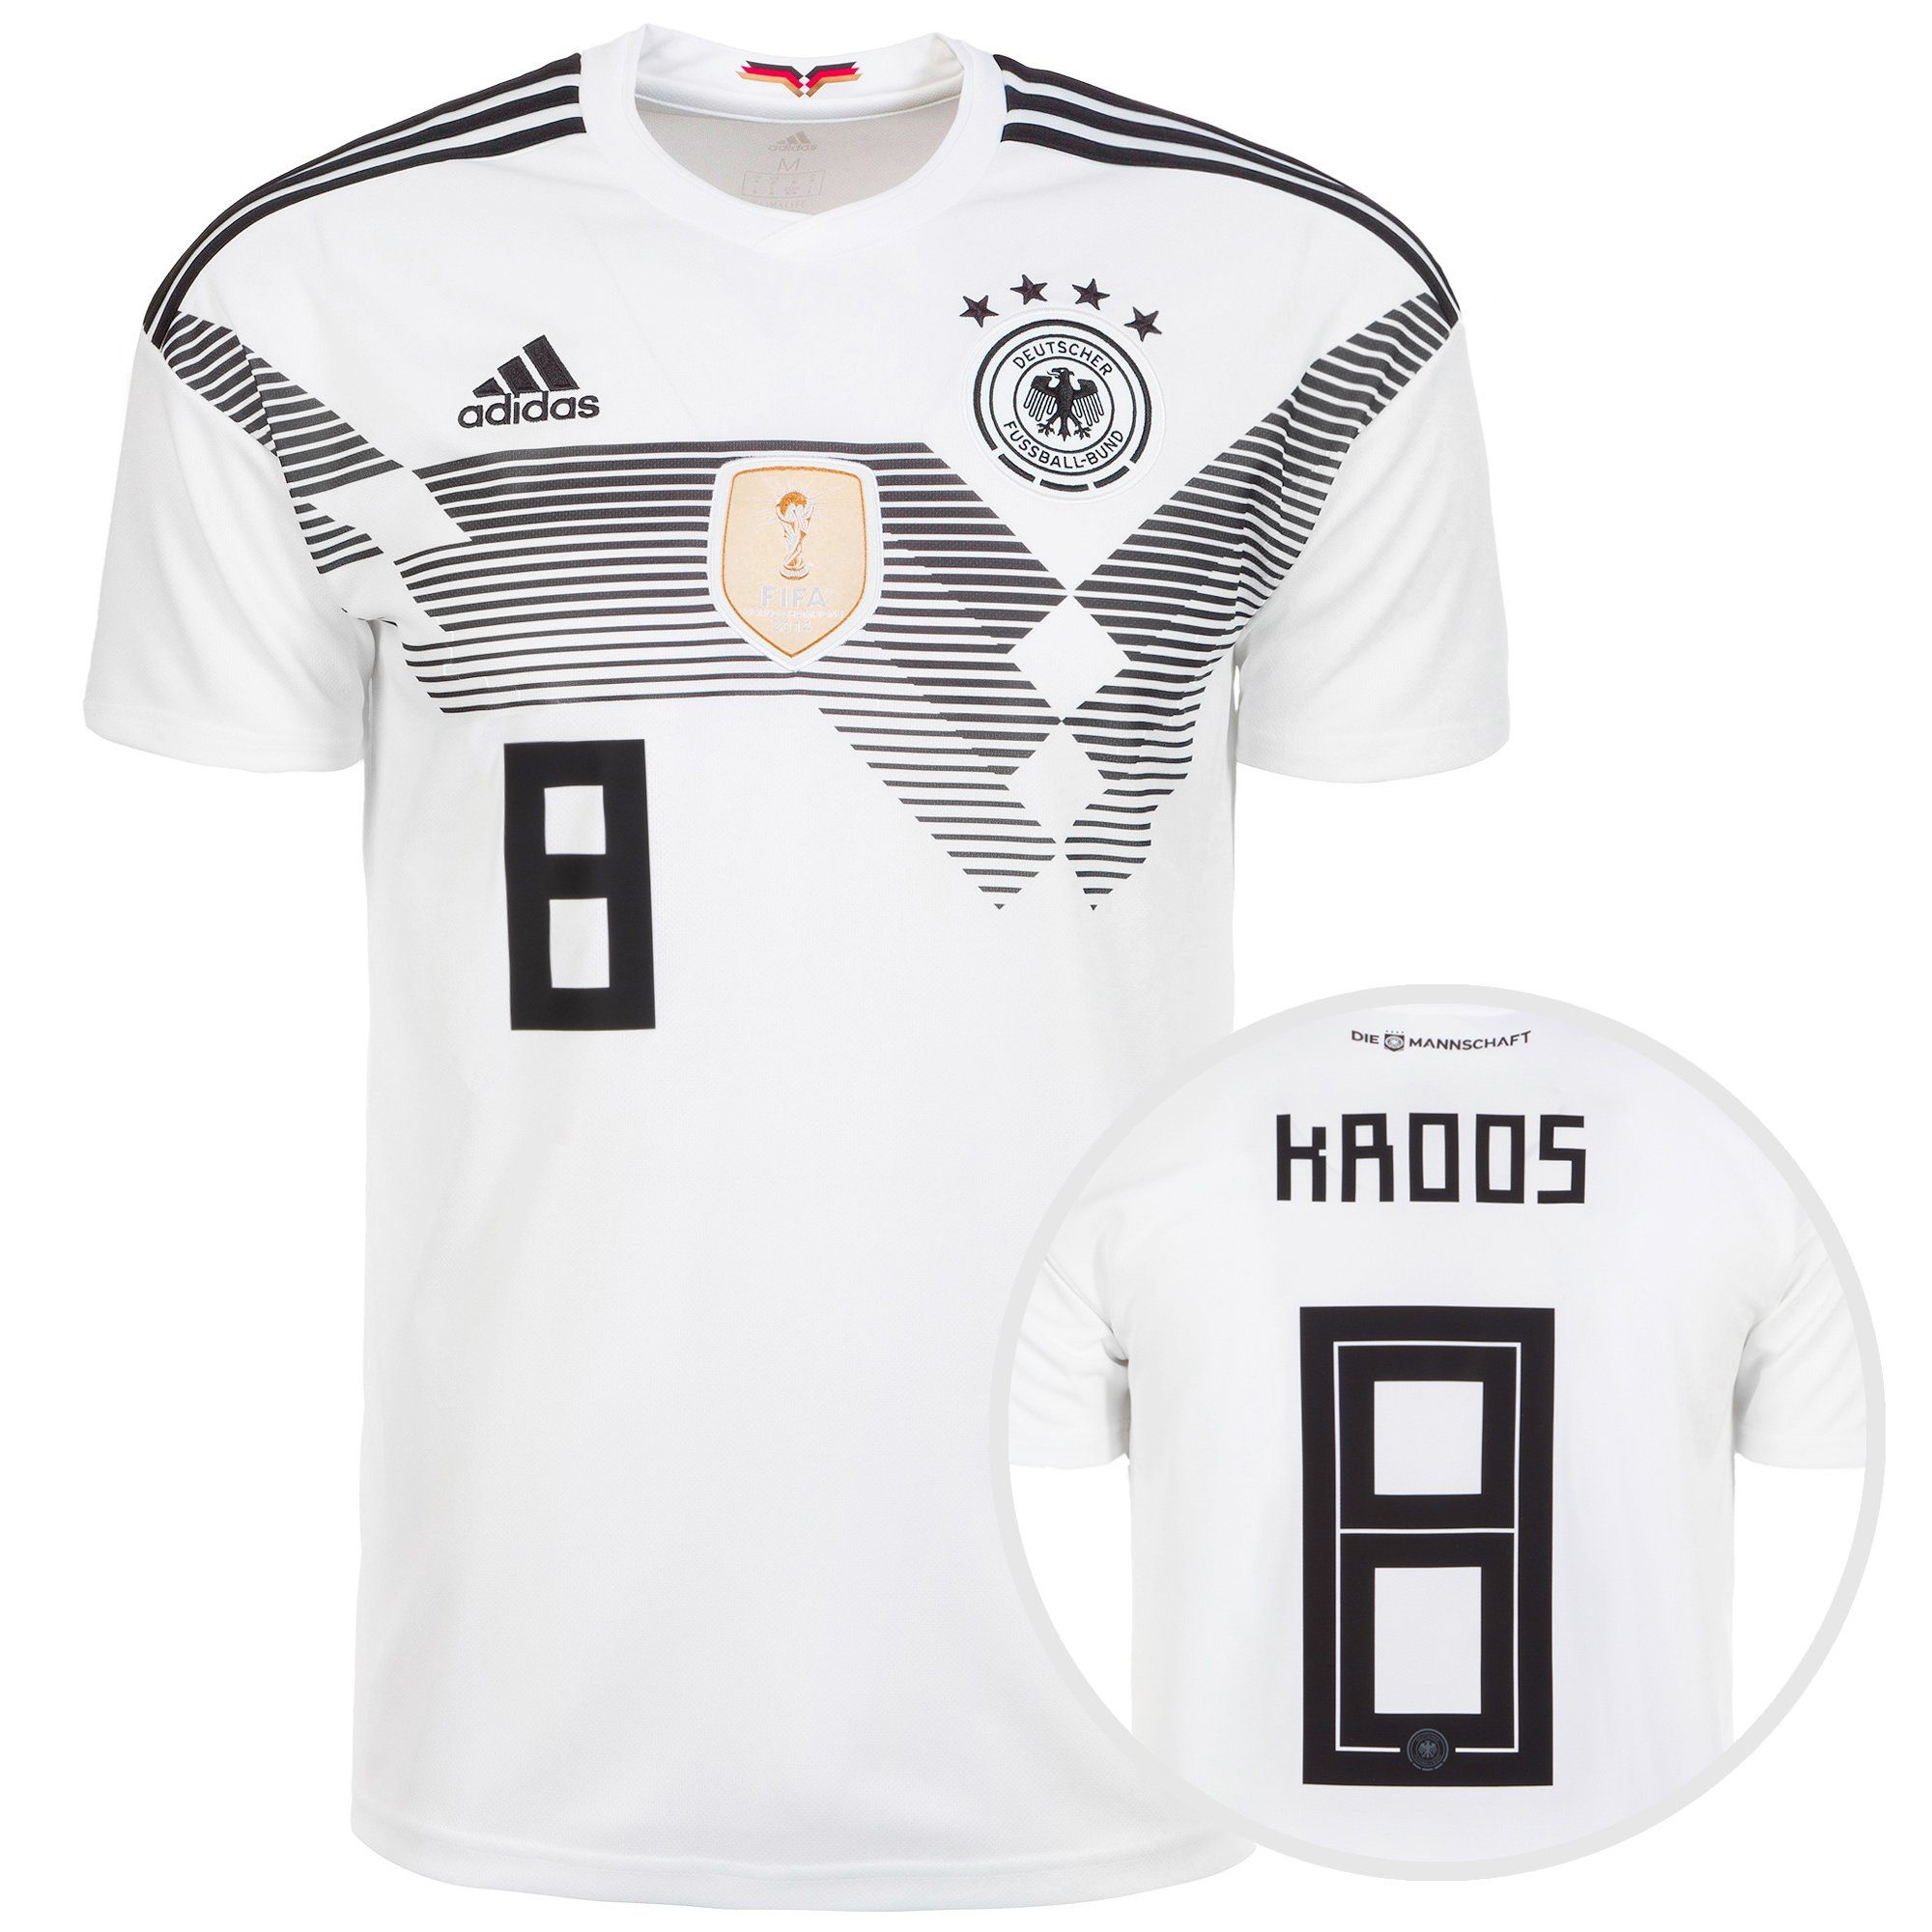 adidas Performance Fußballtrikot Dfb Trikot Kroos Wm 2018 Heim | Sportbekleidung > Trikots > Fußballtrikots | Weiß | Trikot - Wm | Adidas Performance